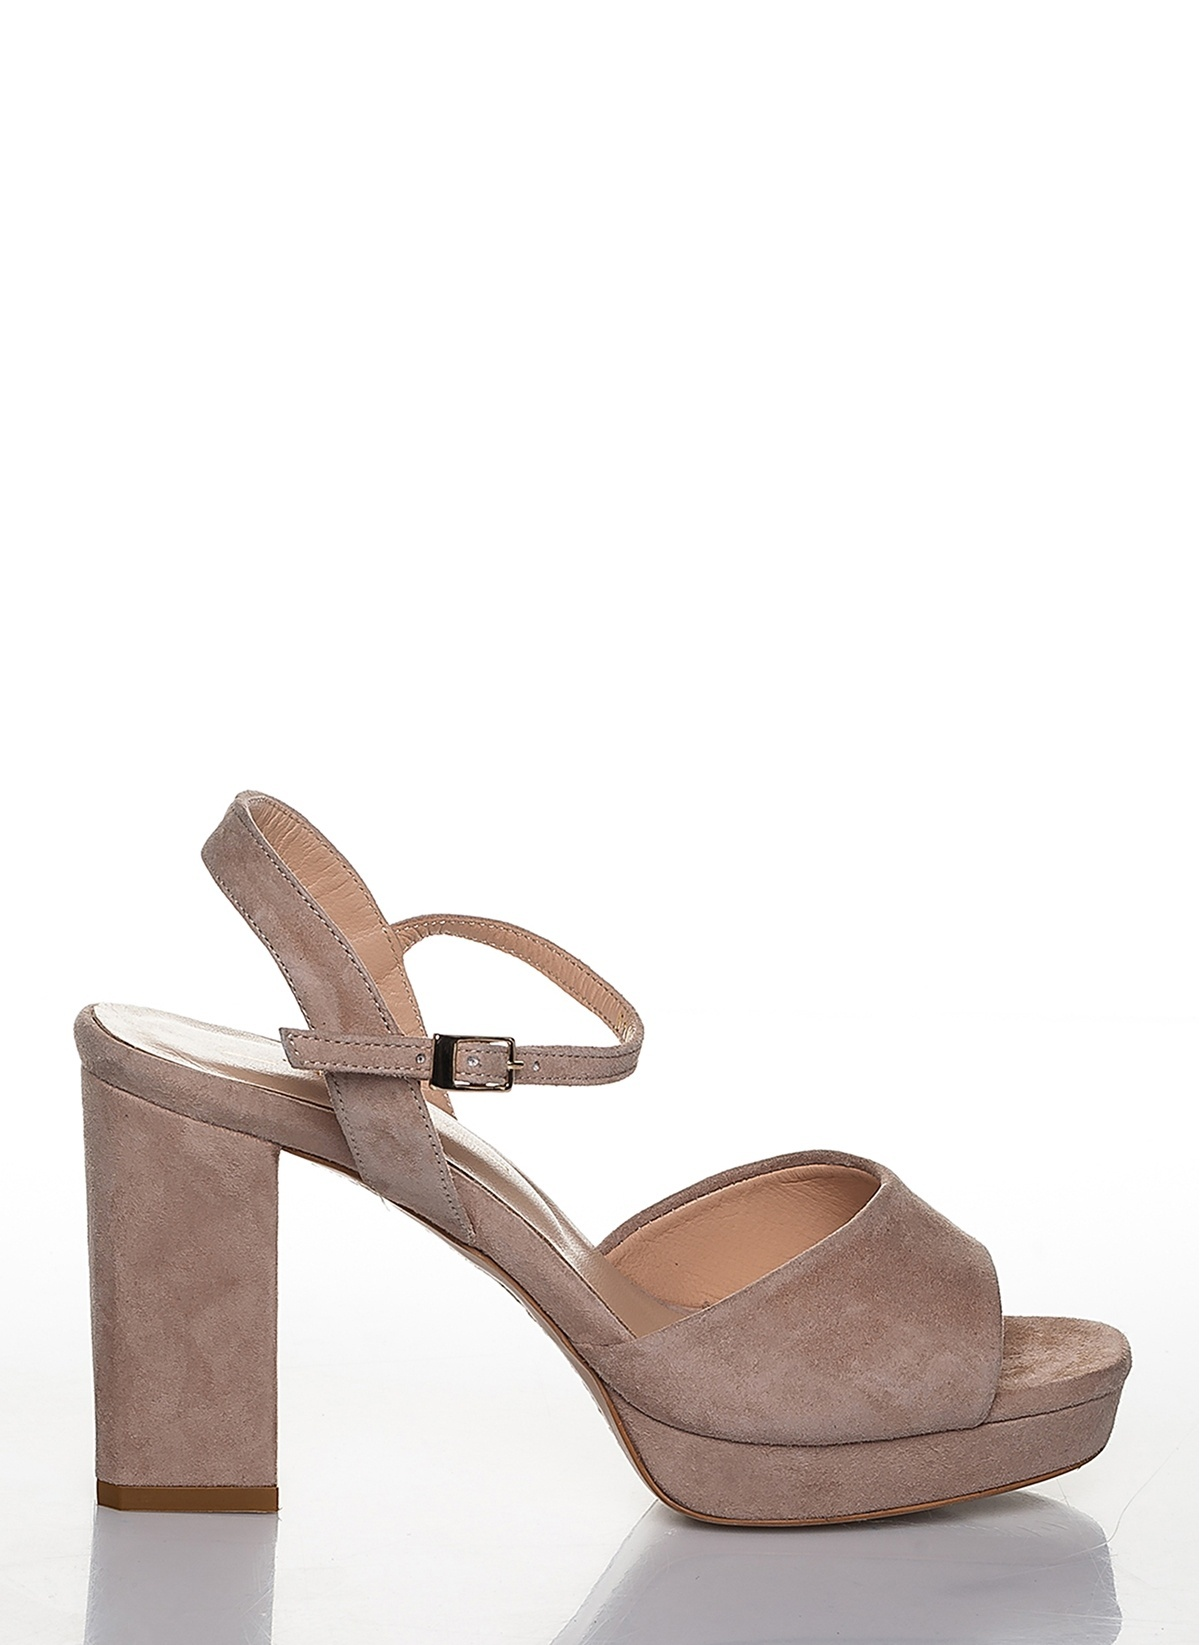 Efem Ayakkabı 19yvcn5173109 Stiletto – 560.0 TL